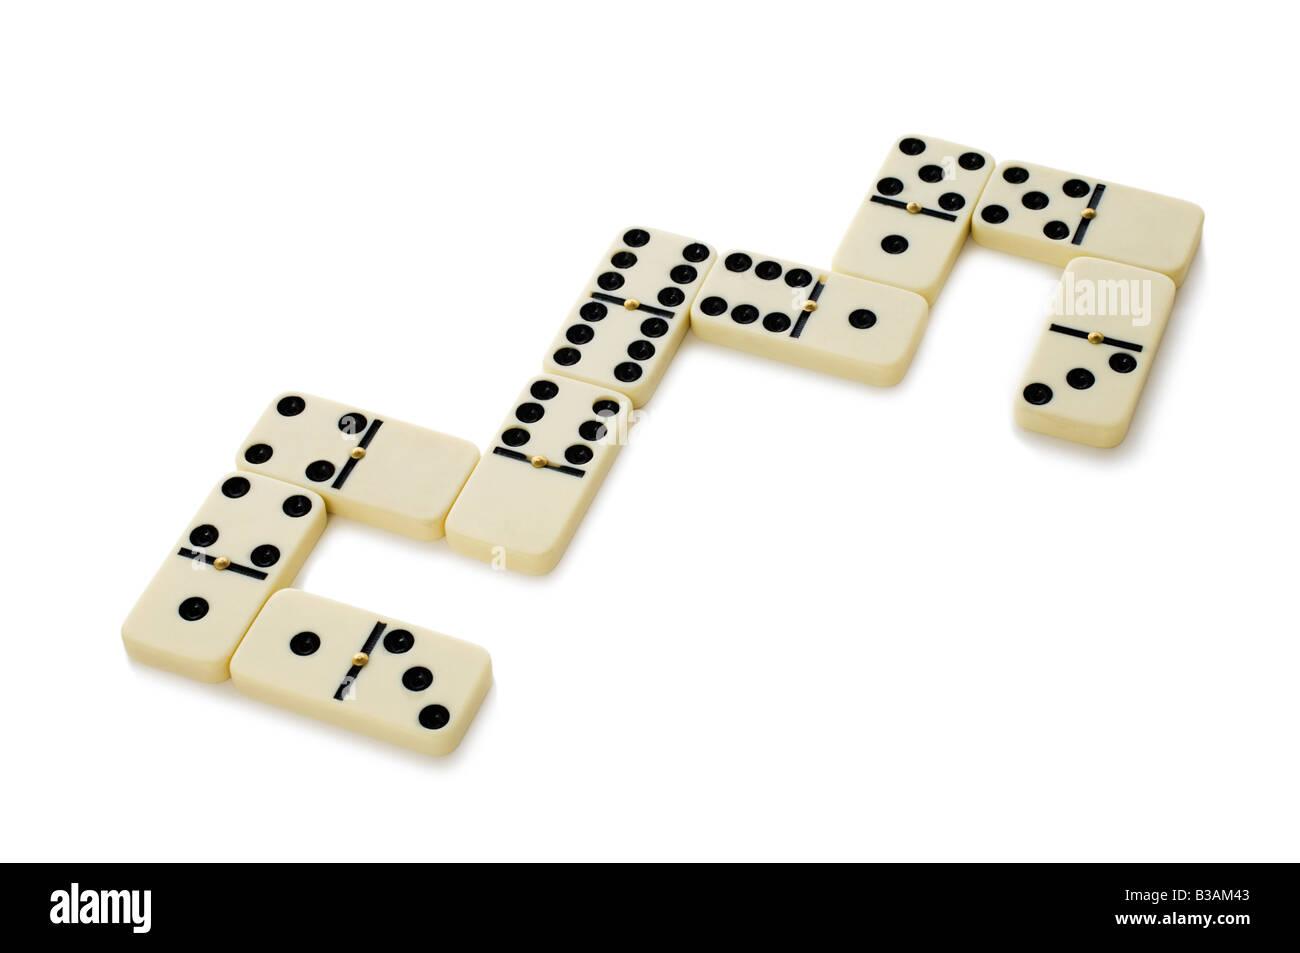 Dominoes Game Stock Photo 19289651 Alamy